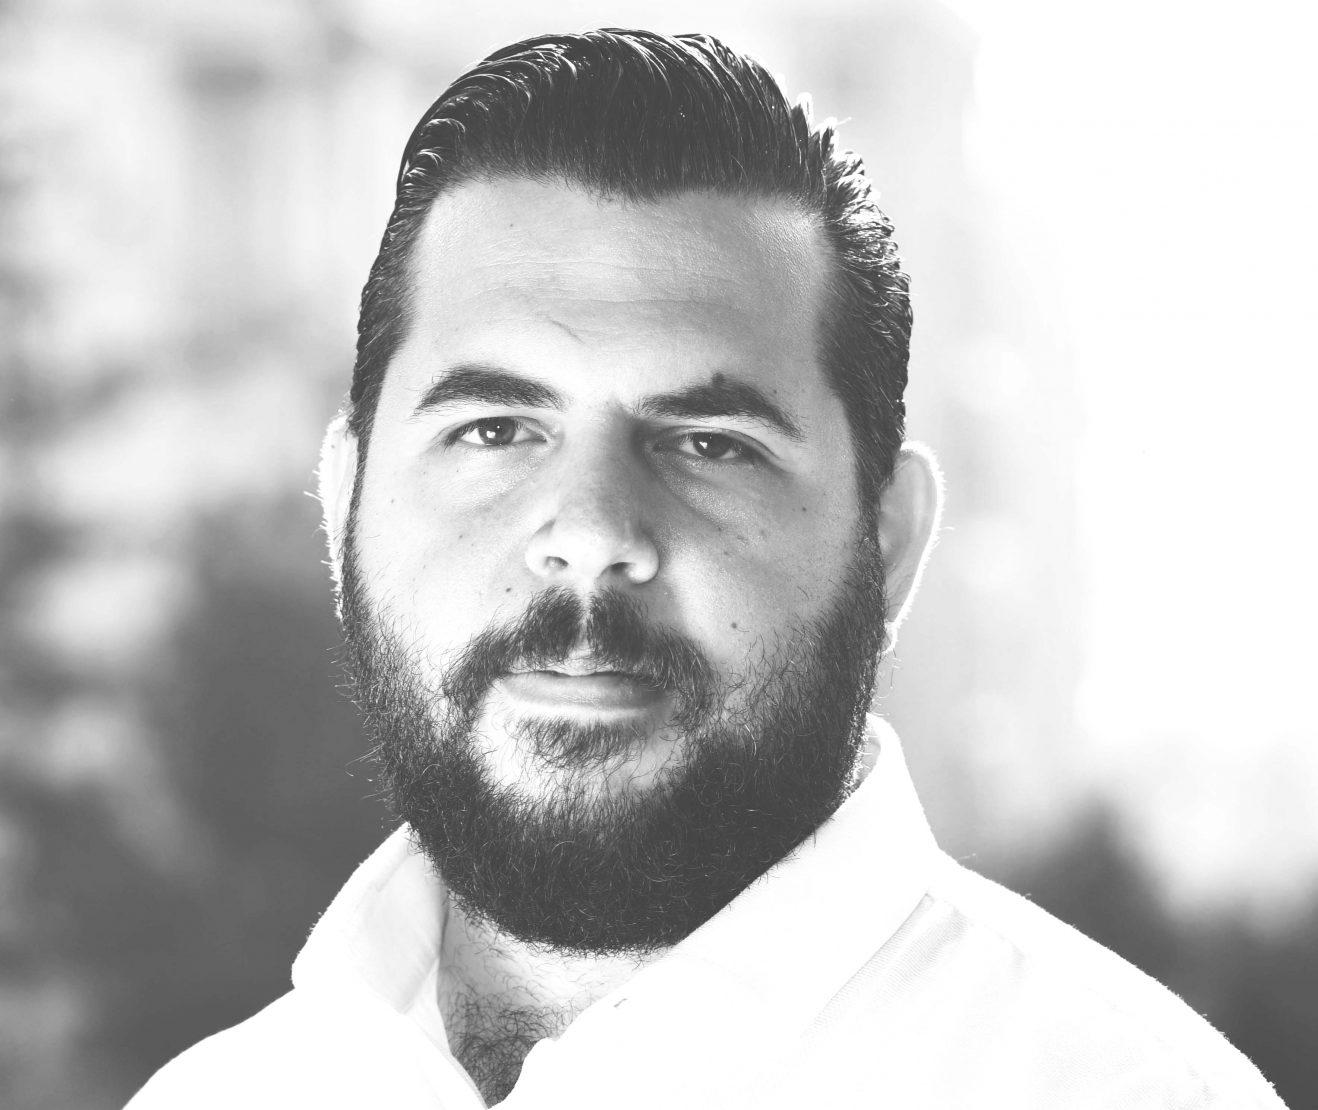 جاد شحرور - صحافي لبناني